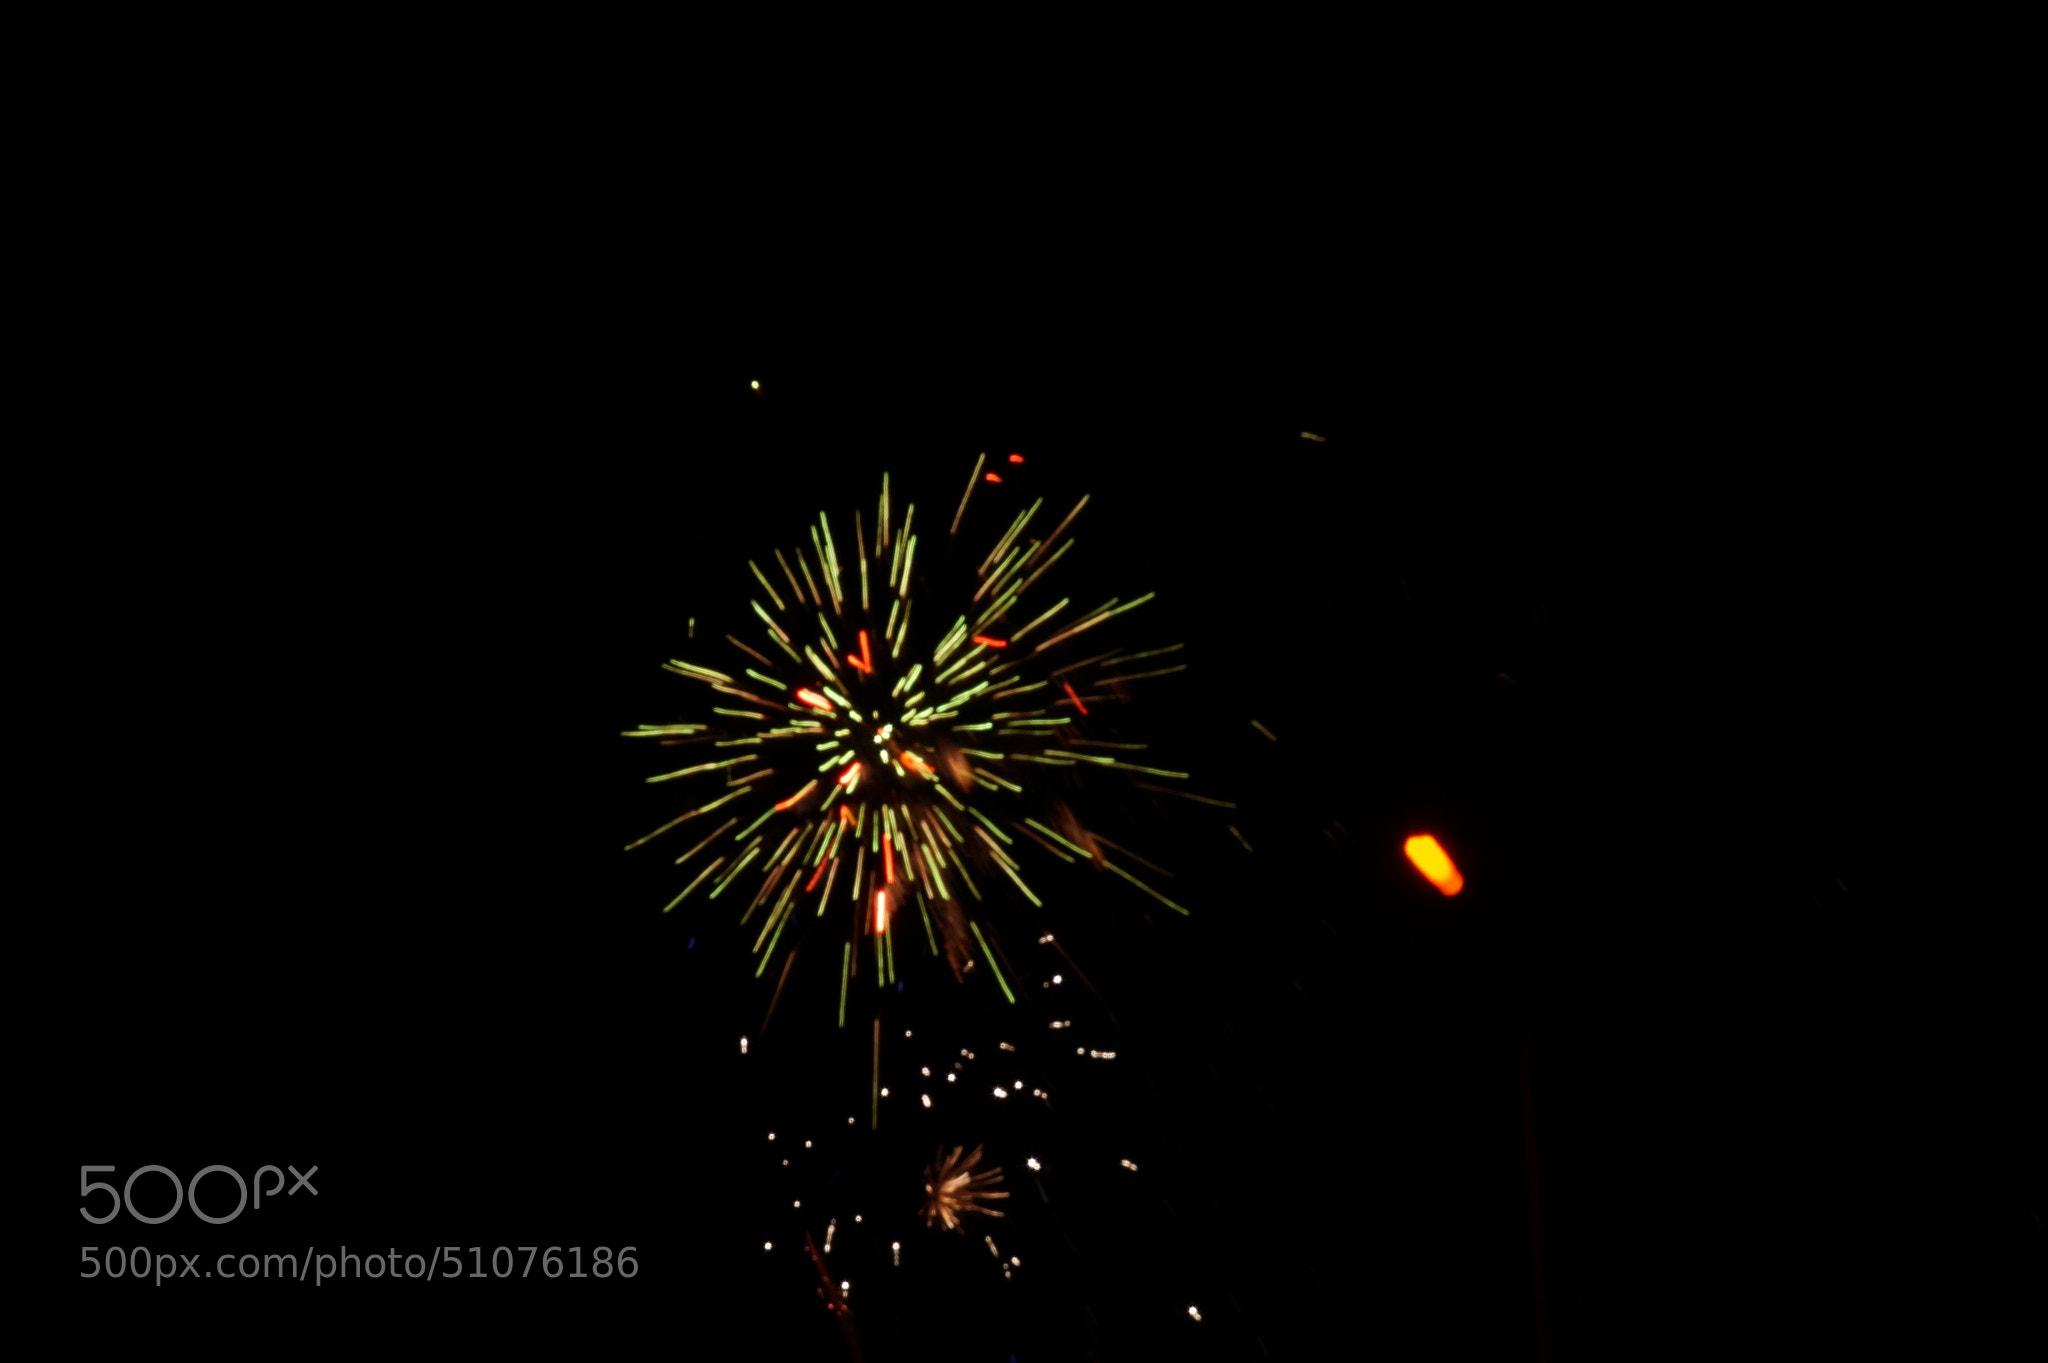 Photograph Fireworks 3 by Robin Jones on 500px